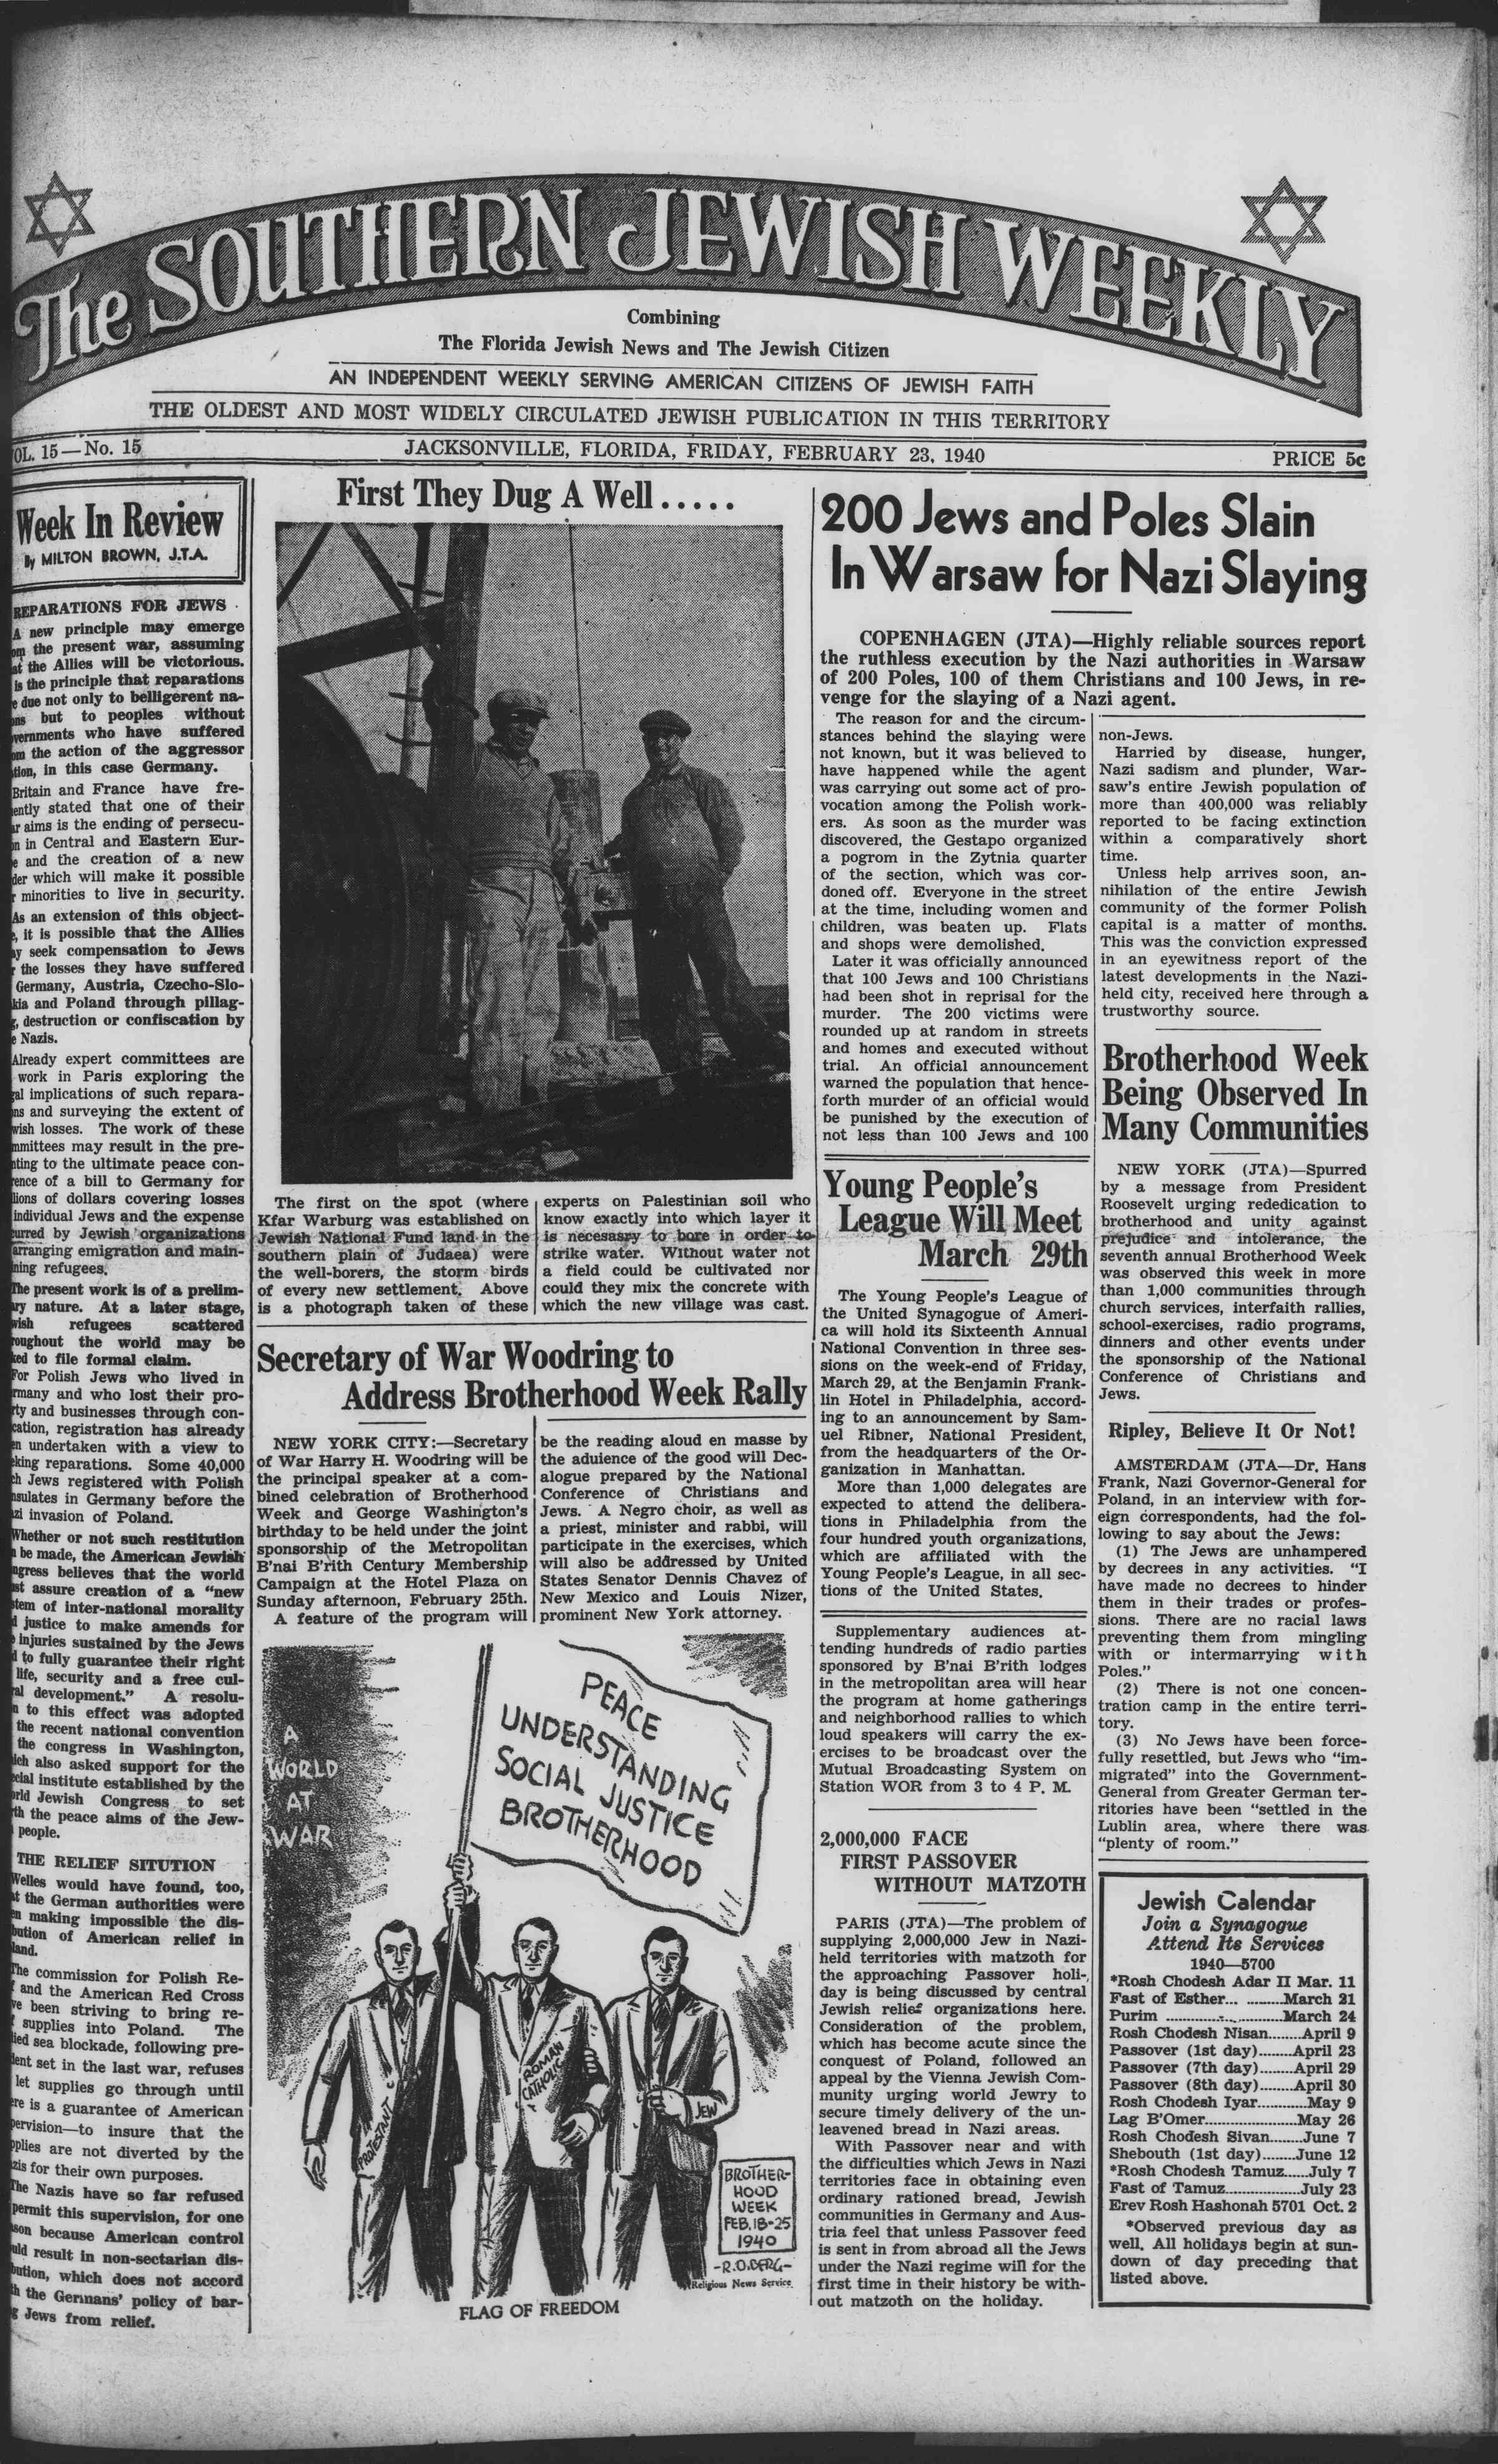 23 Şubat 1940 Tarihli Southern Jewish Weekly Dergisi Sayfa 1